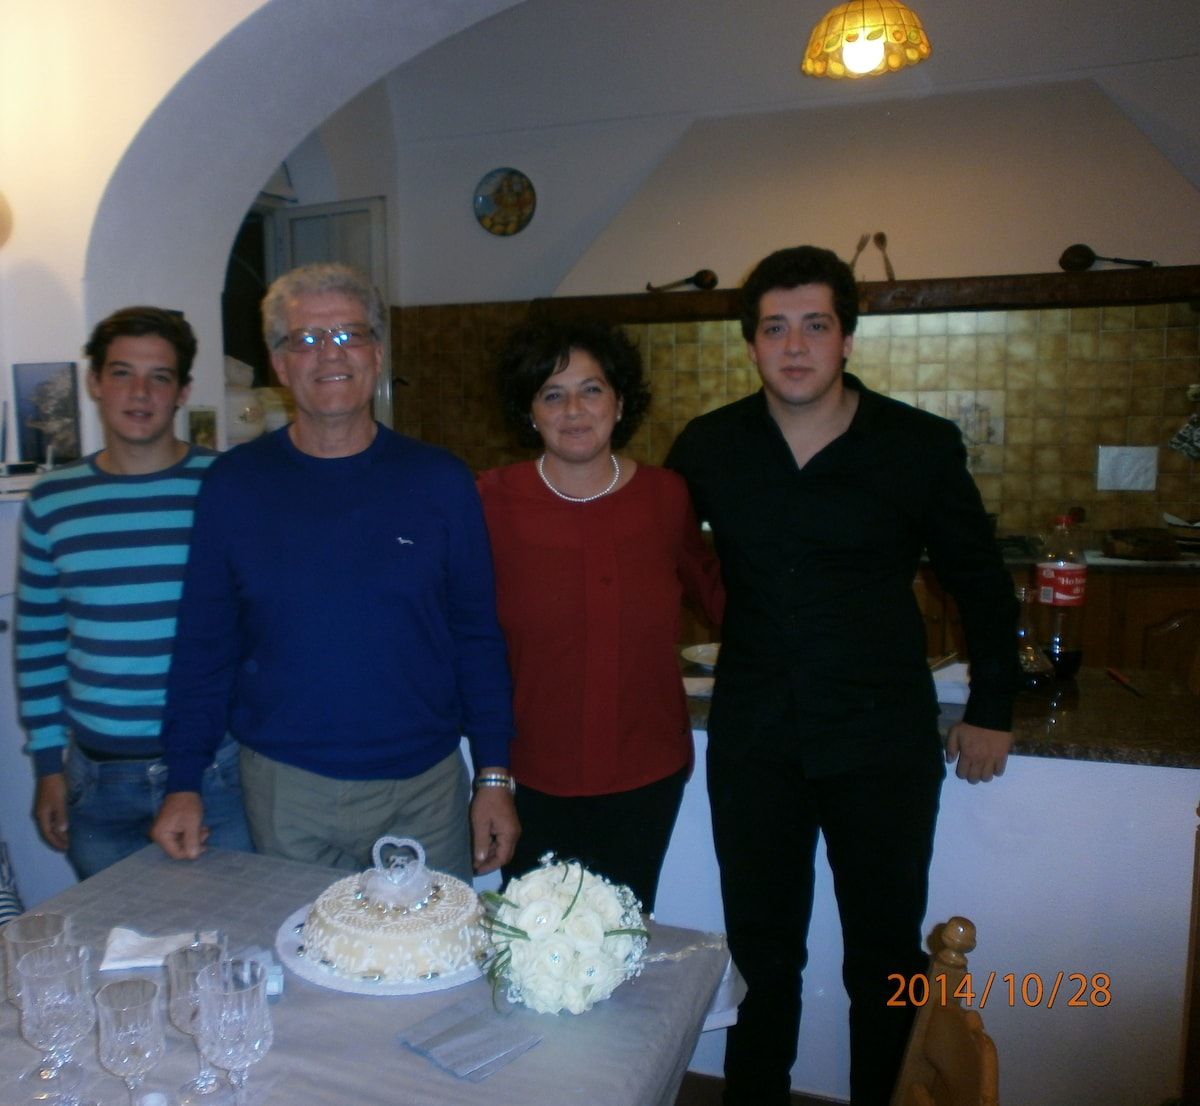 Antonio & Laura from Positano